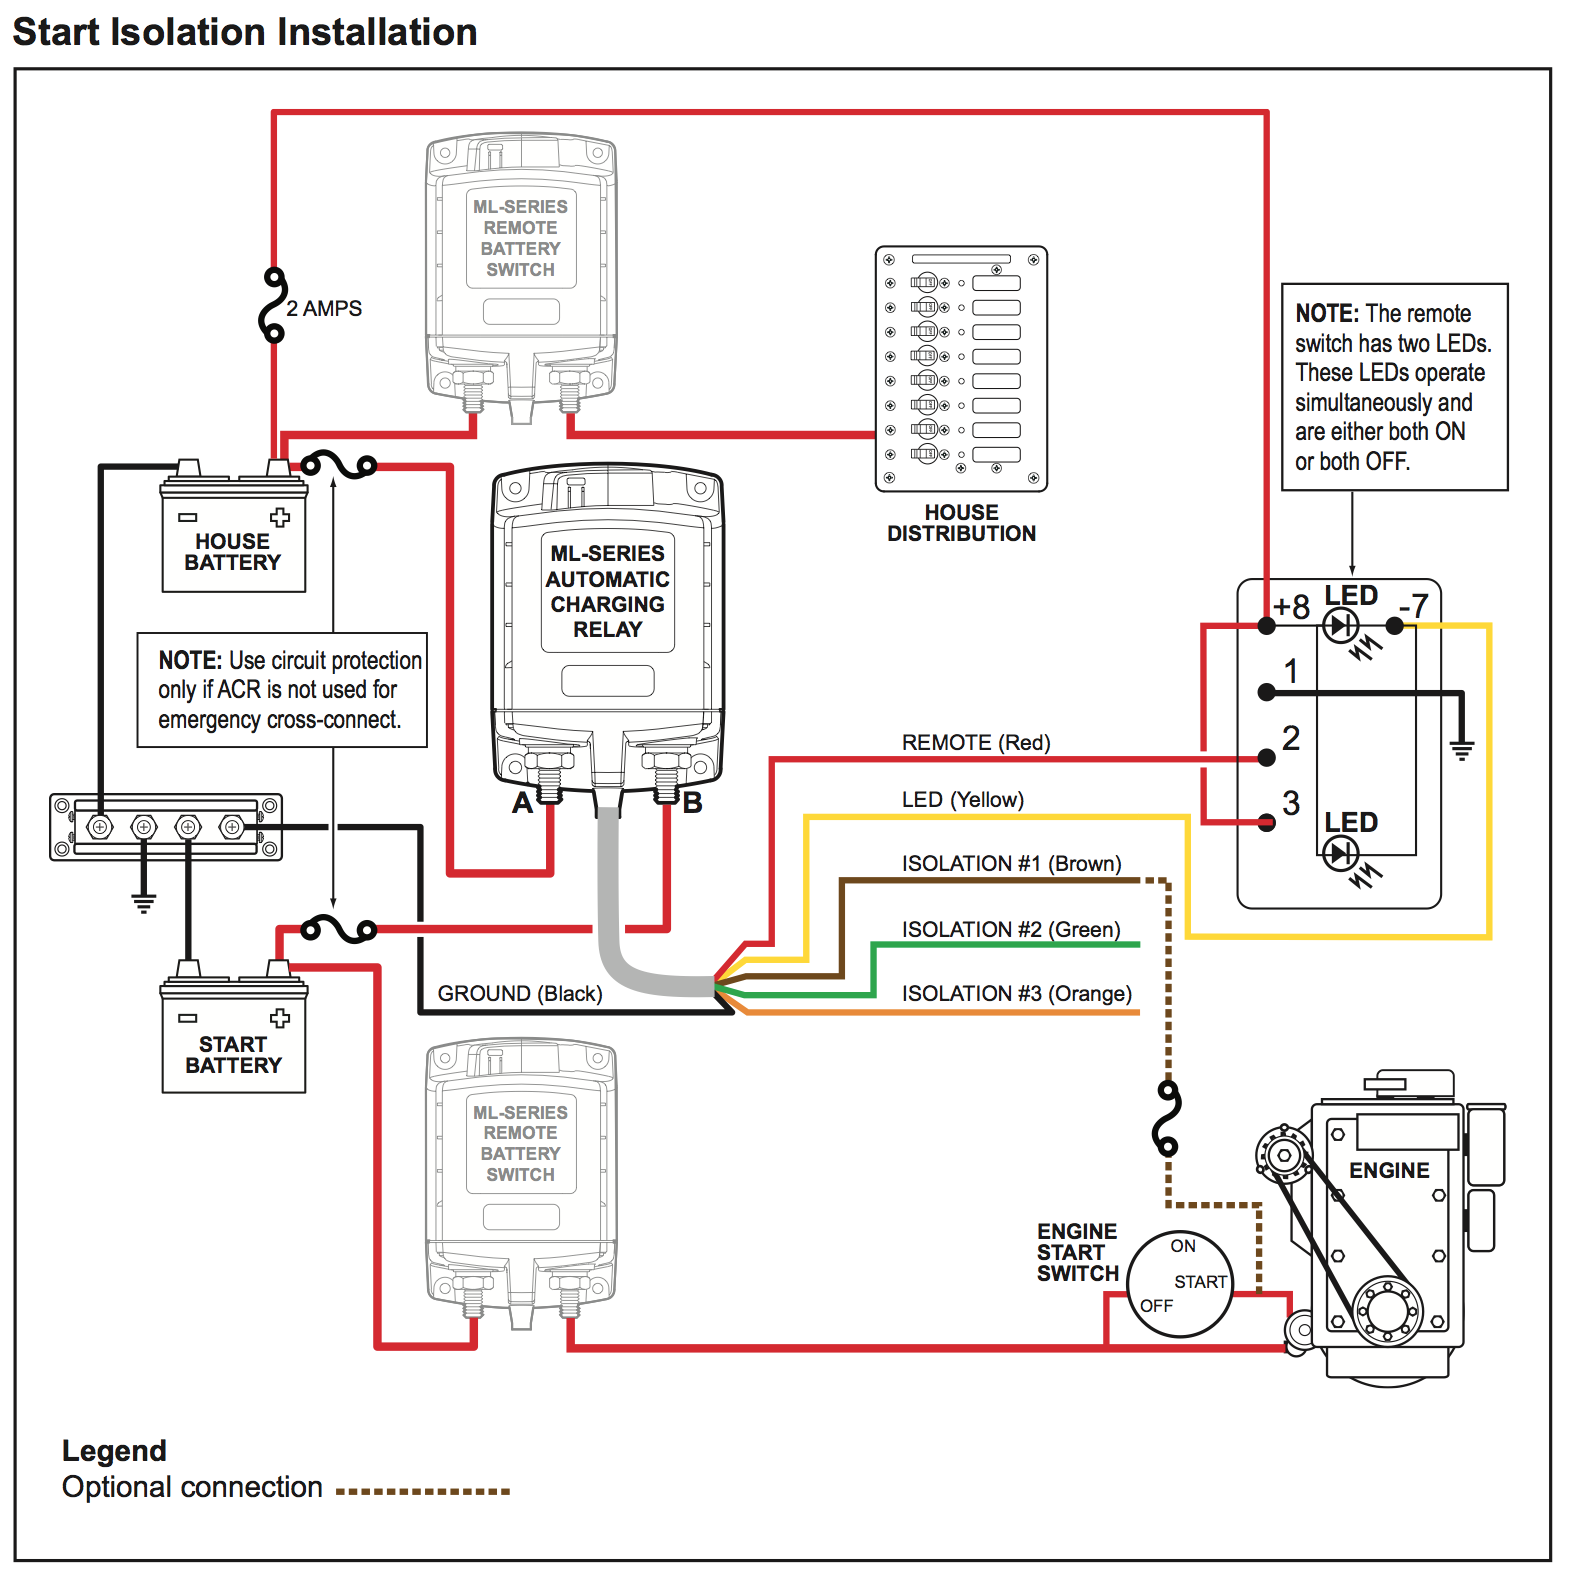 [DIAGRAM_4FR]  VN_1964] Switch Wiring Diagram Rv Solar Panel Wiring Diagram Blue Sea  Systems Wiring Diagram | Seachoice Wiring Diagram |  | Spon Kesian Illuminateatx Librar Wiring 101